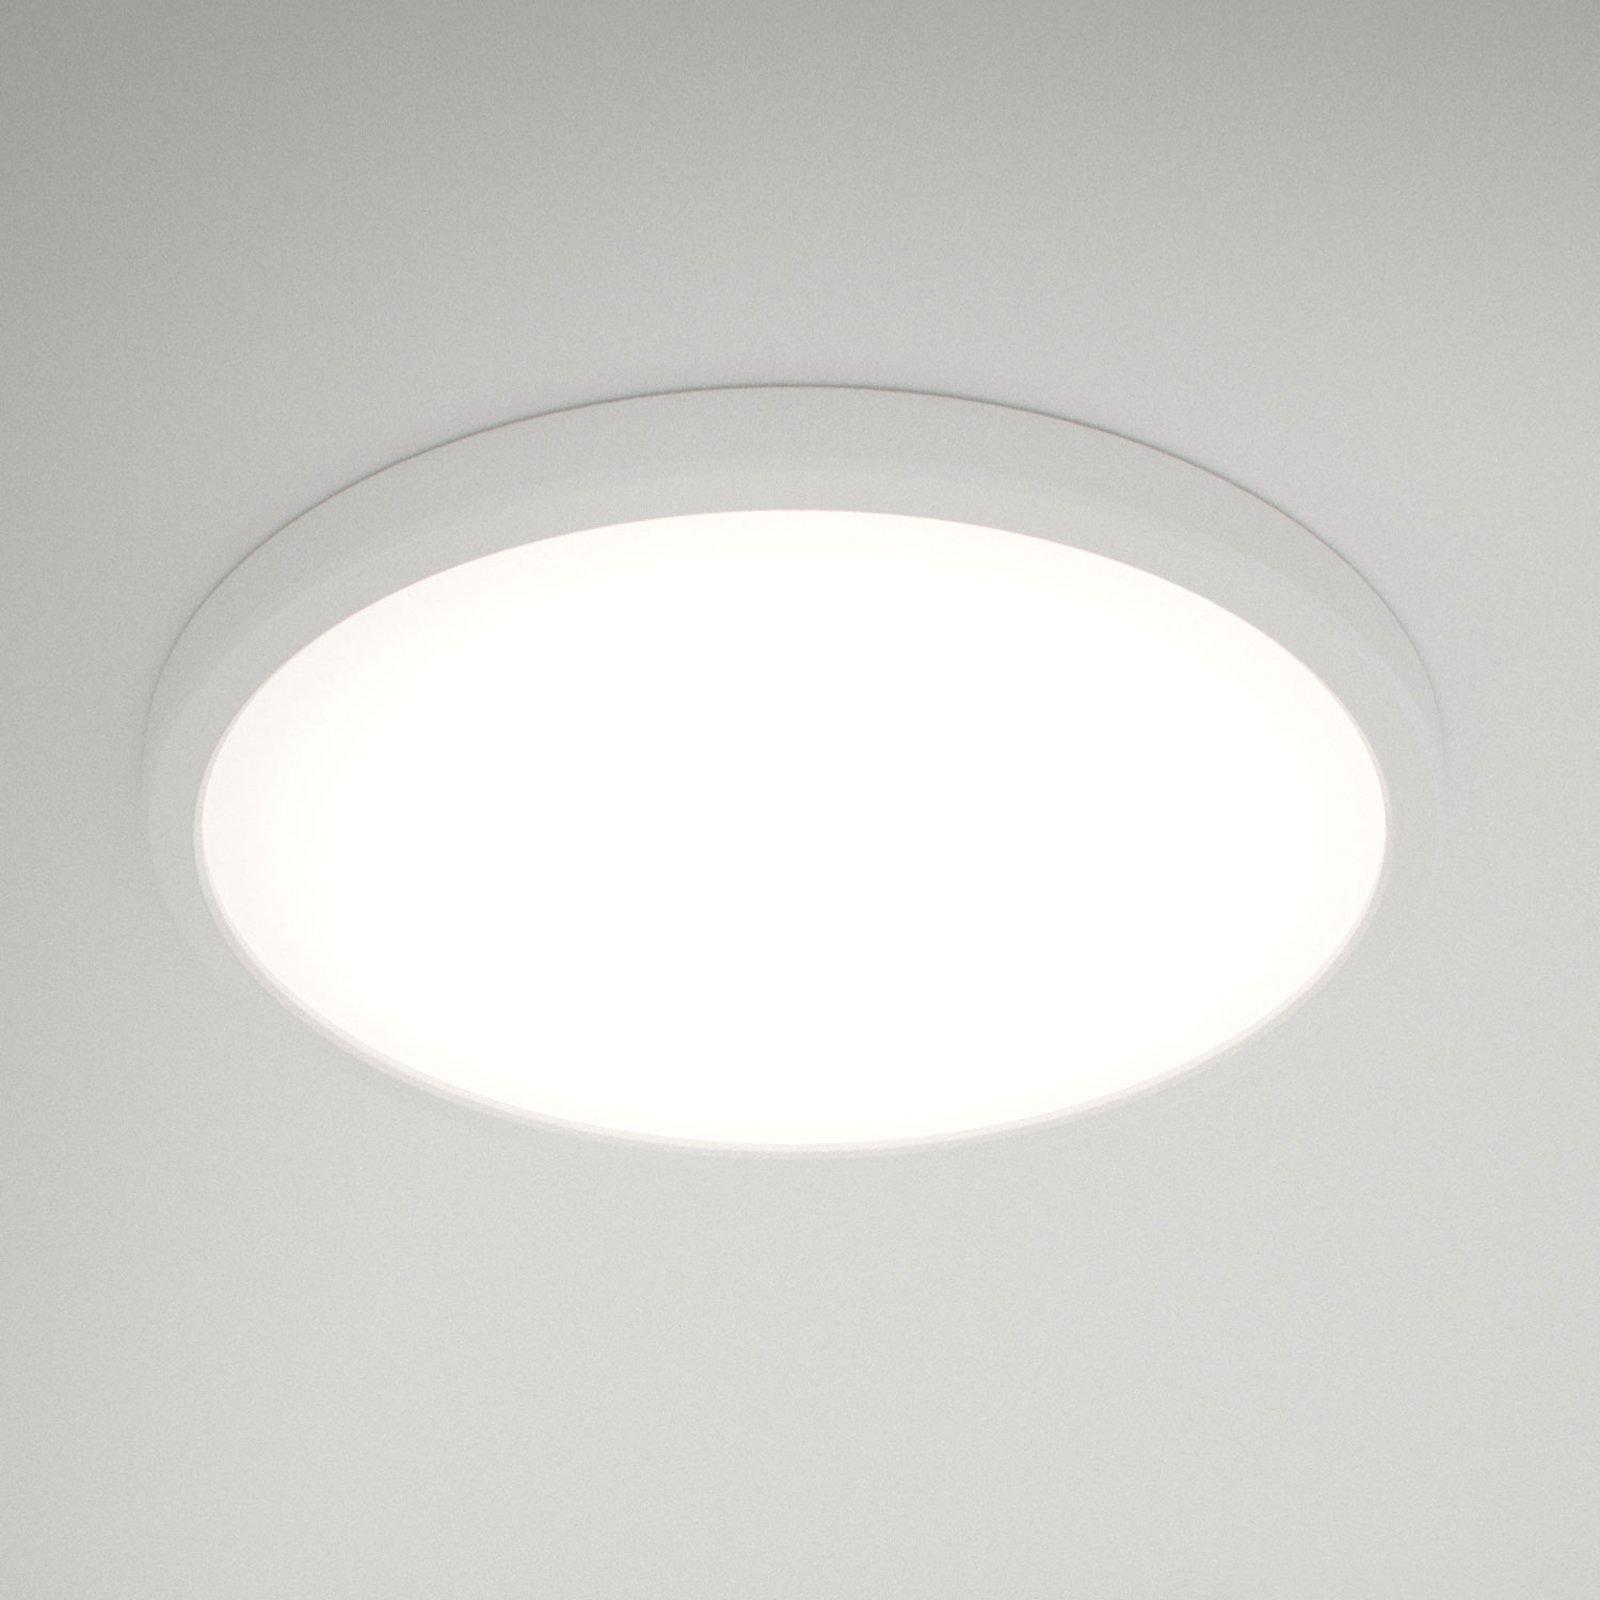 LED.taklampe Oja 29 IP54 2 700 K